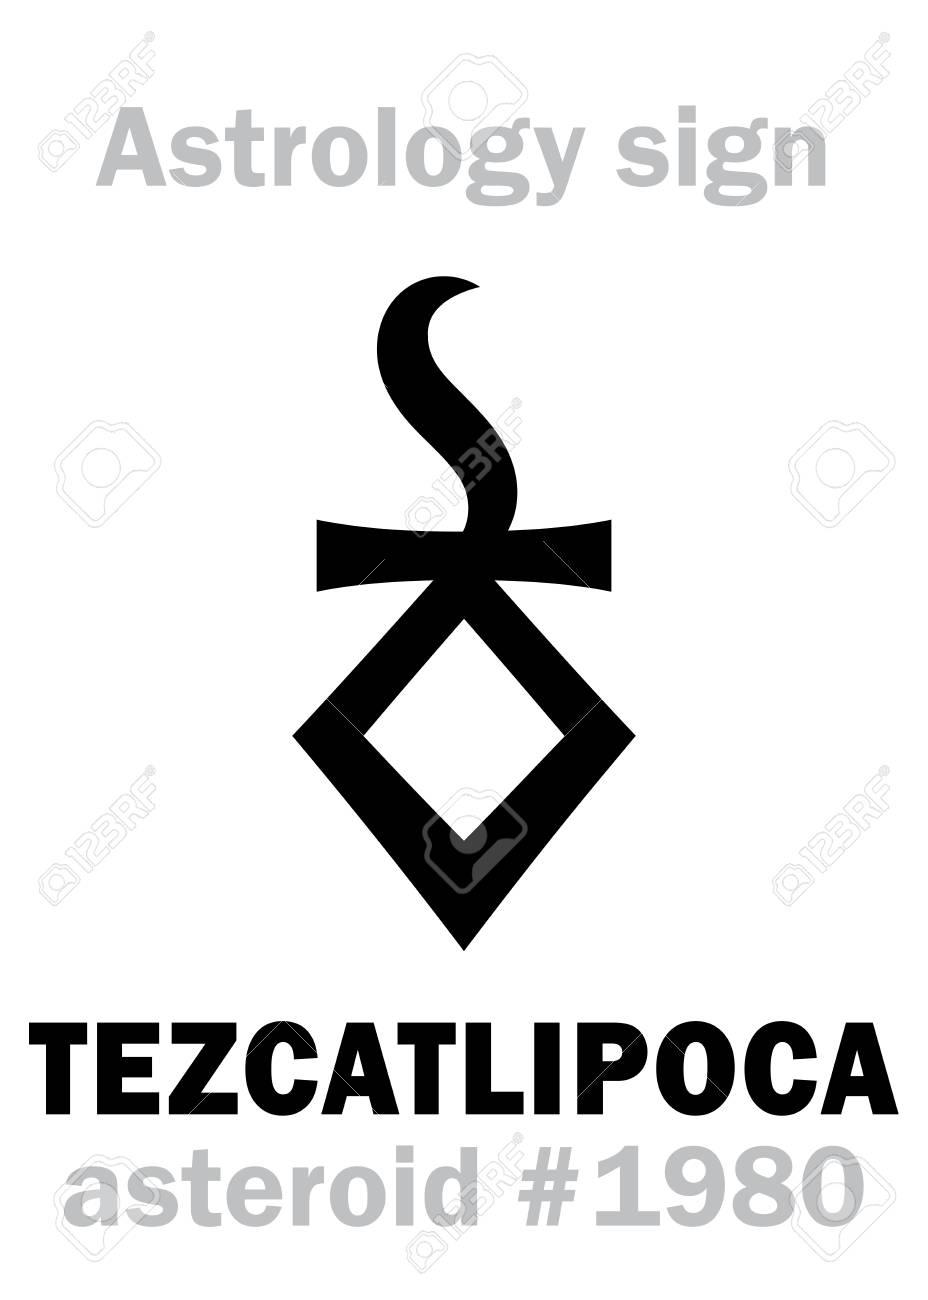 Astrology Alphabet: TEZCATLIPOCA (Smoking Mirror), asteroid #1980